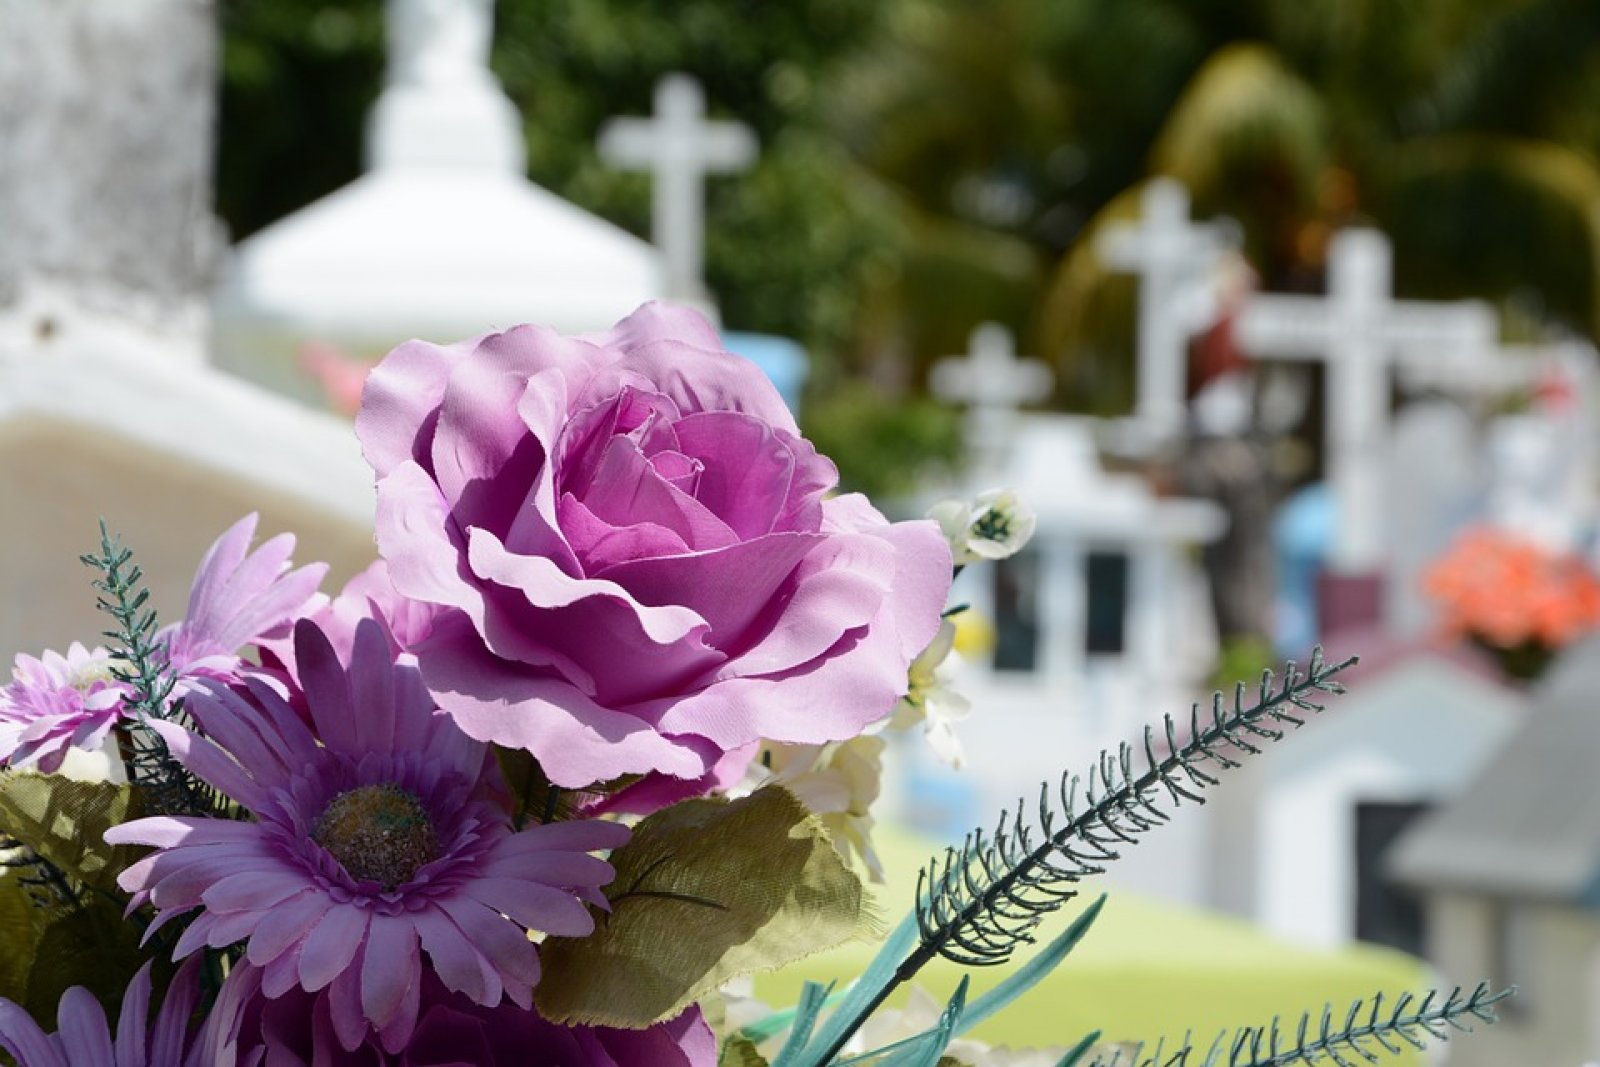 flors en un cementiri